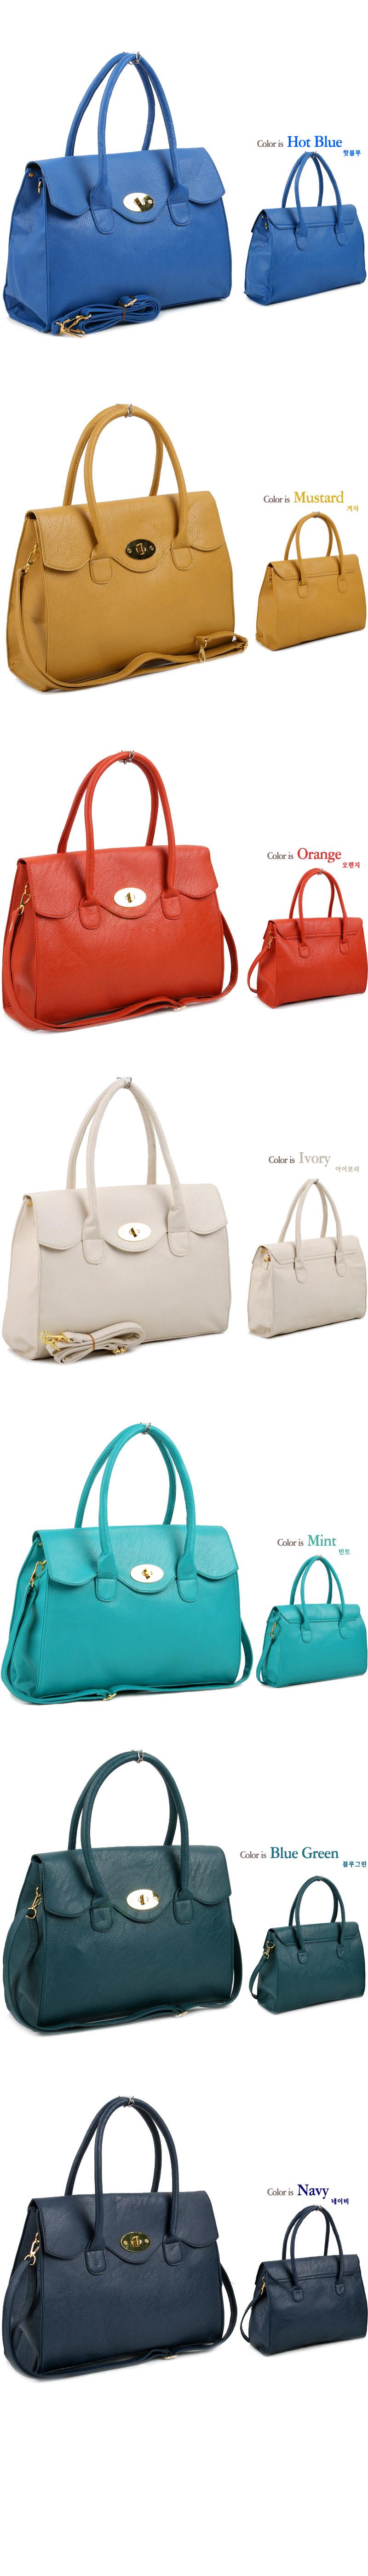 Shoulder&tote bag no. K18200view-M